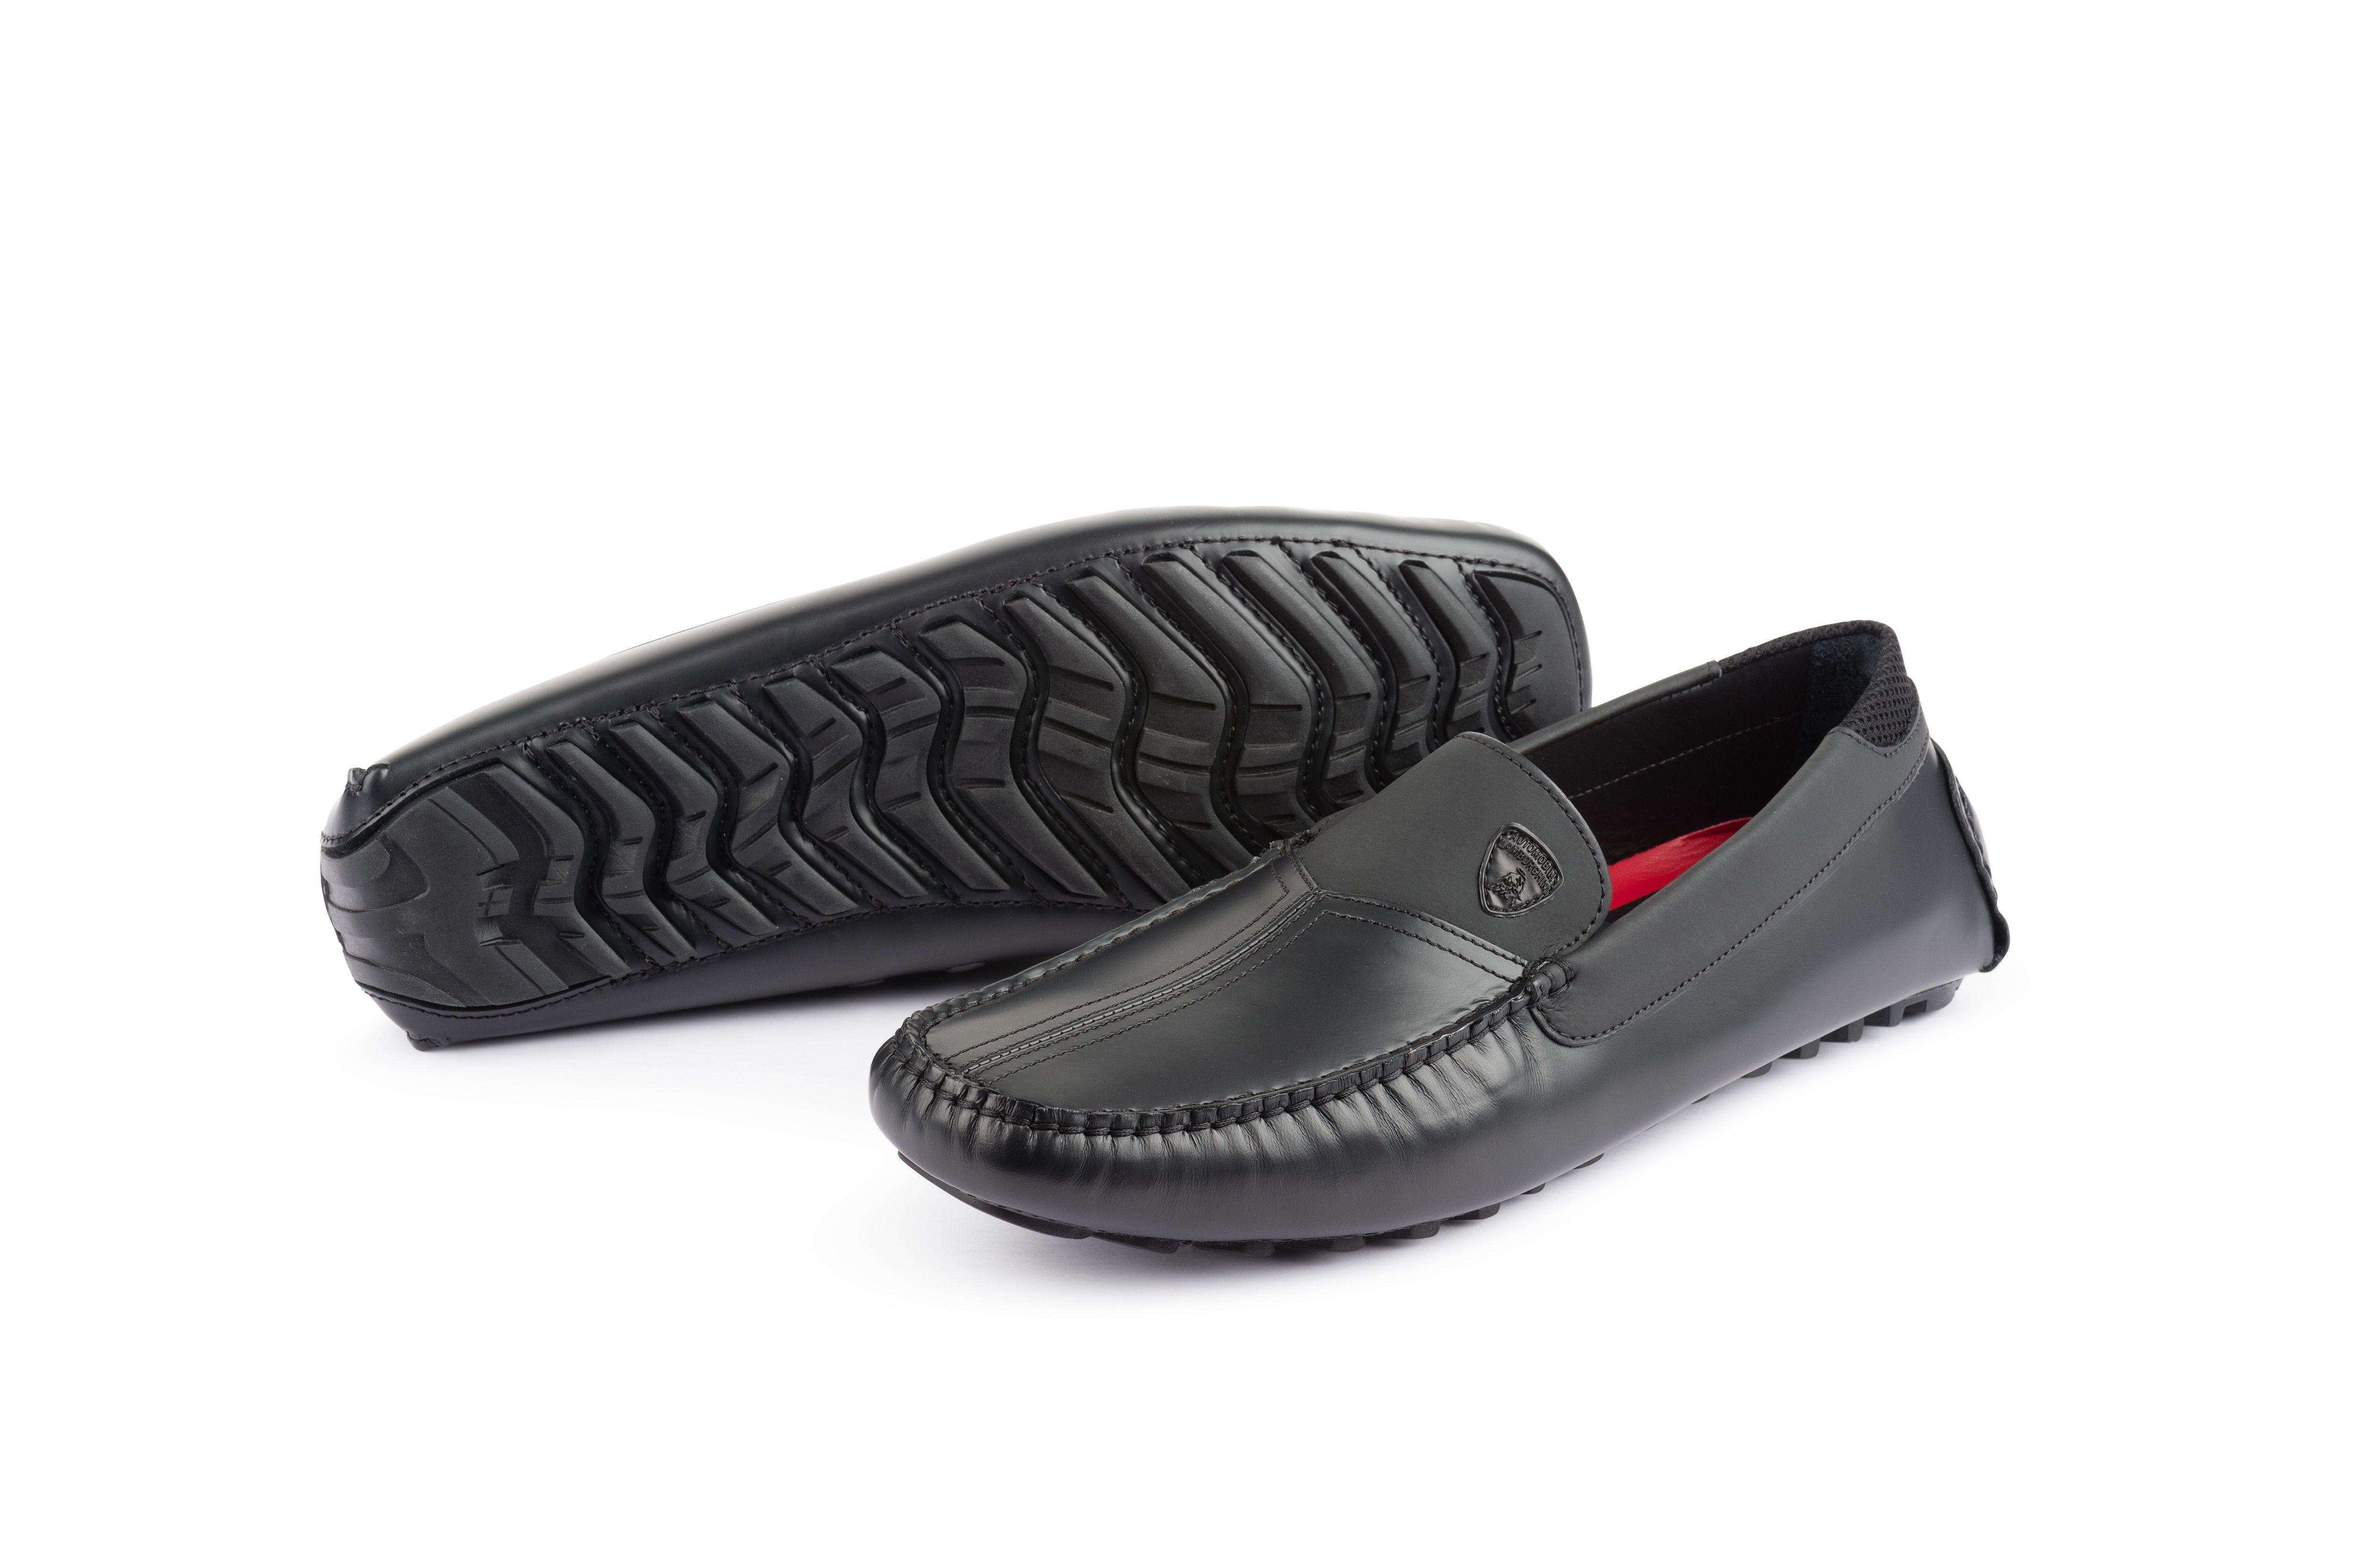 low priced ee20b 65305 air jordan 4 premium obsidian  aventador pirelli edition loafers black  collezione automobili lamborghini